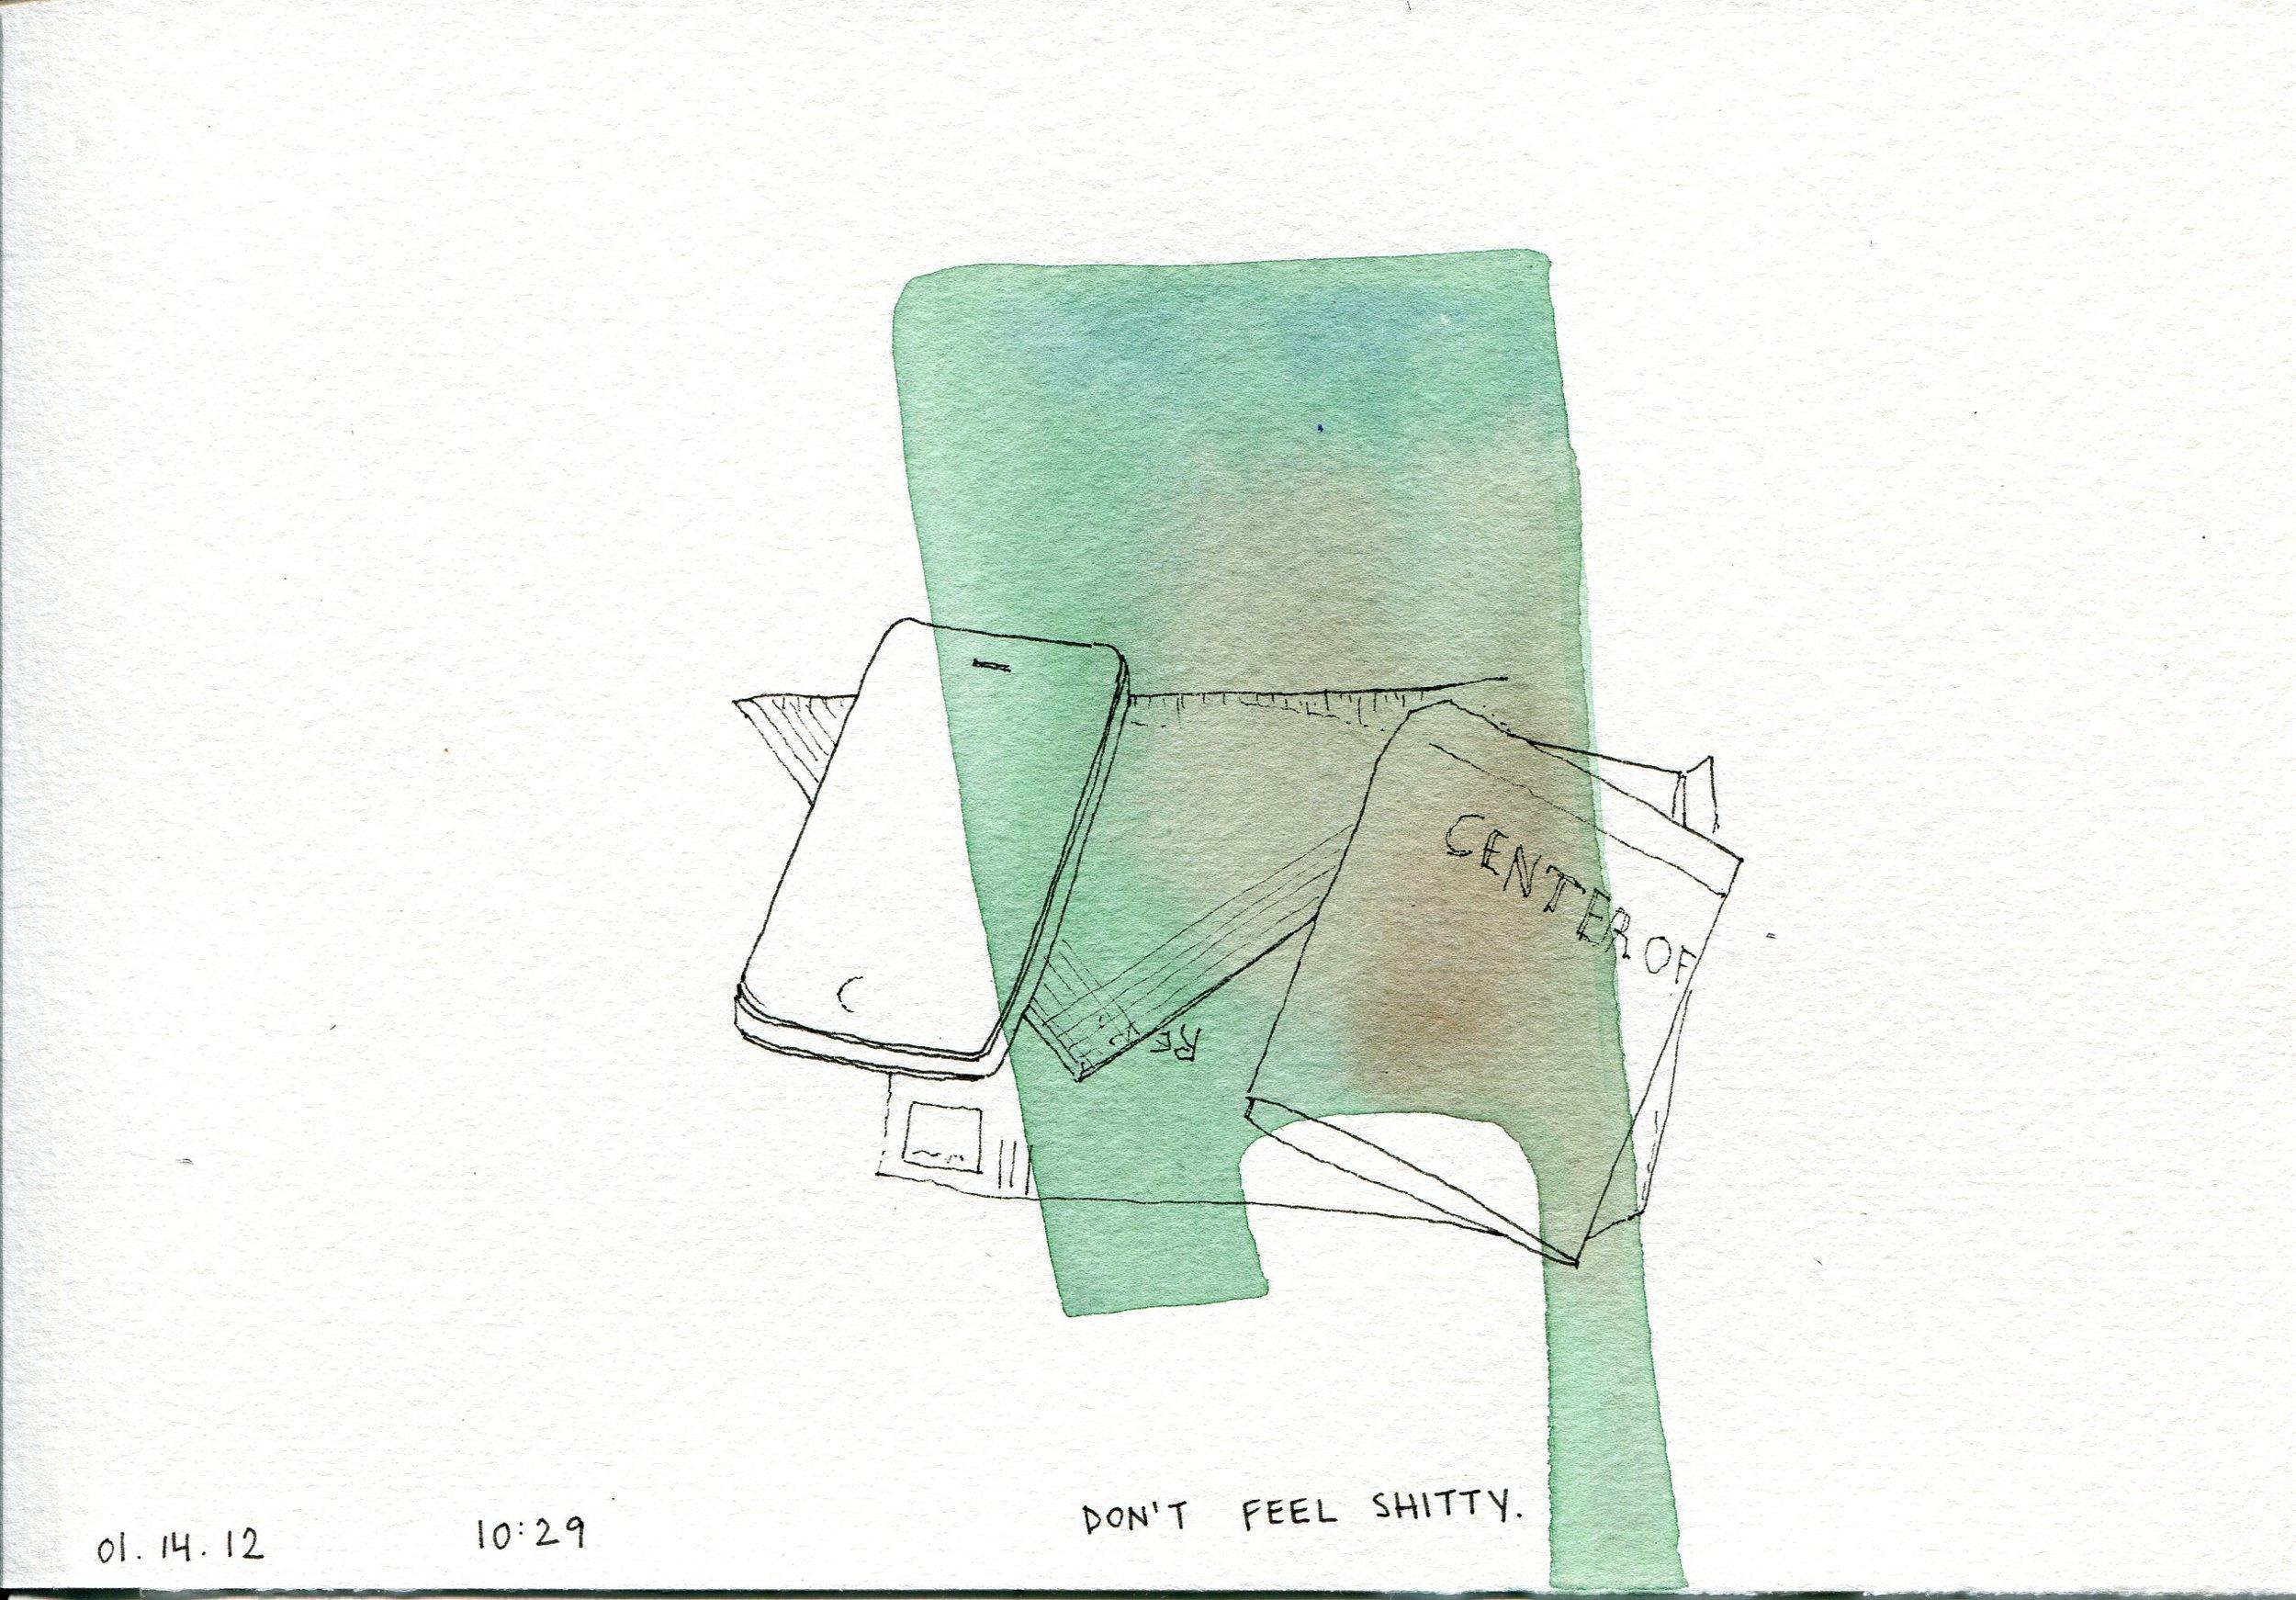 2012-01-20 drawing001.jpg